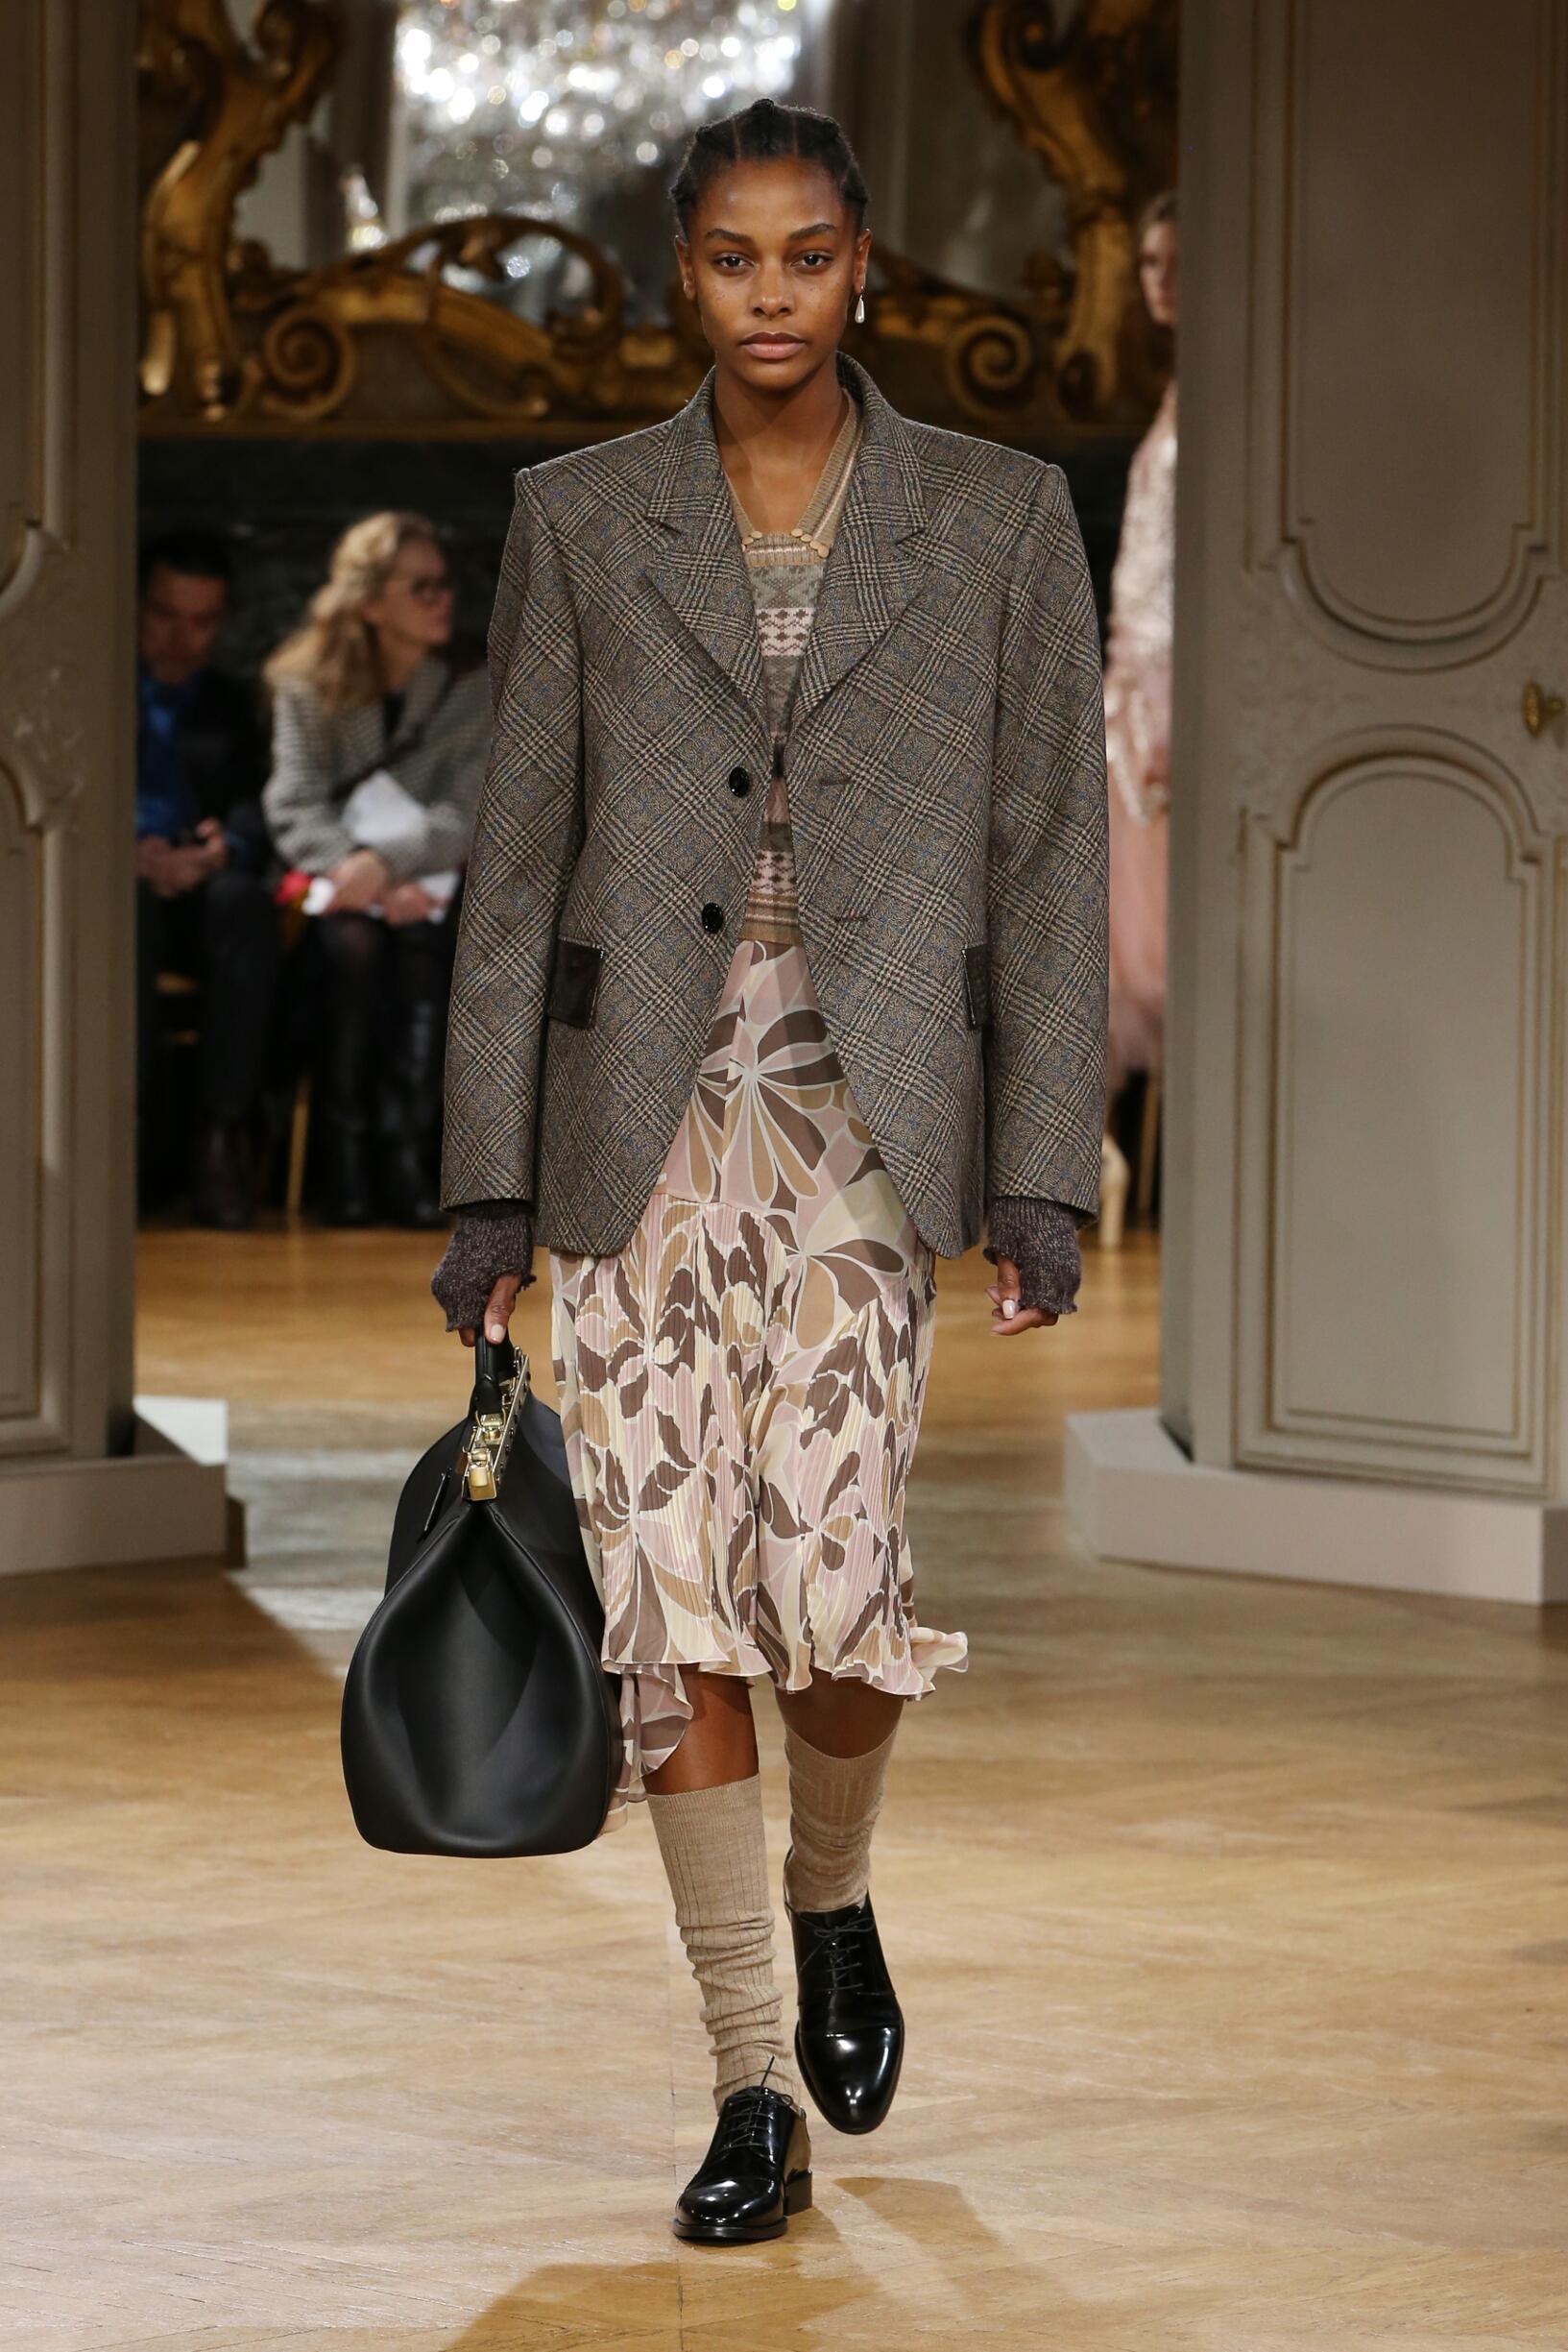 Fall Fashion Woman Trends 2018 John Galliano